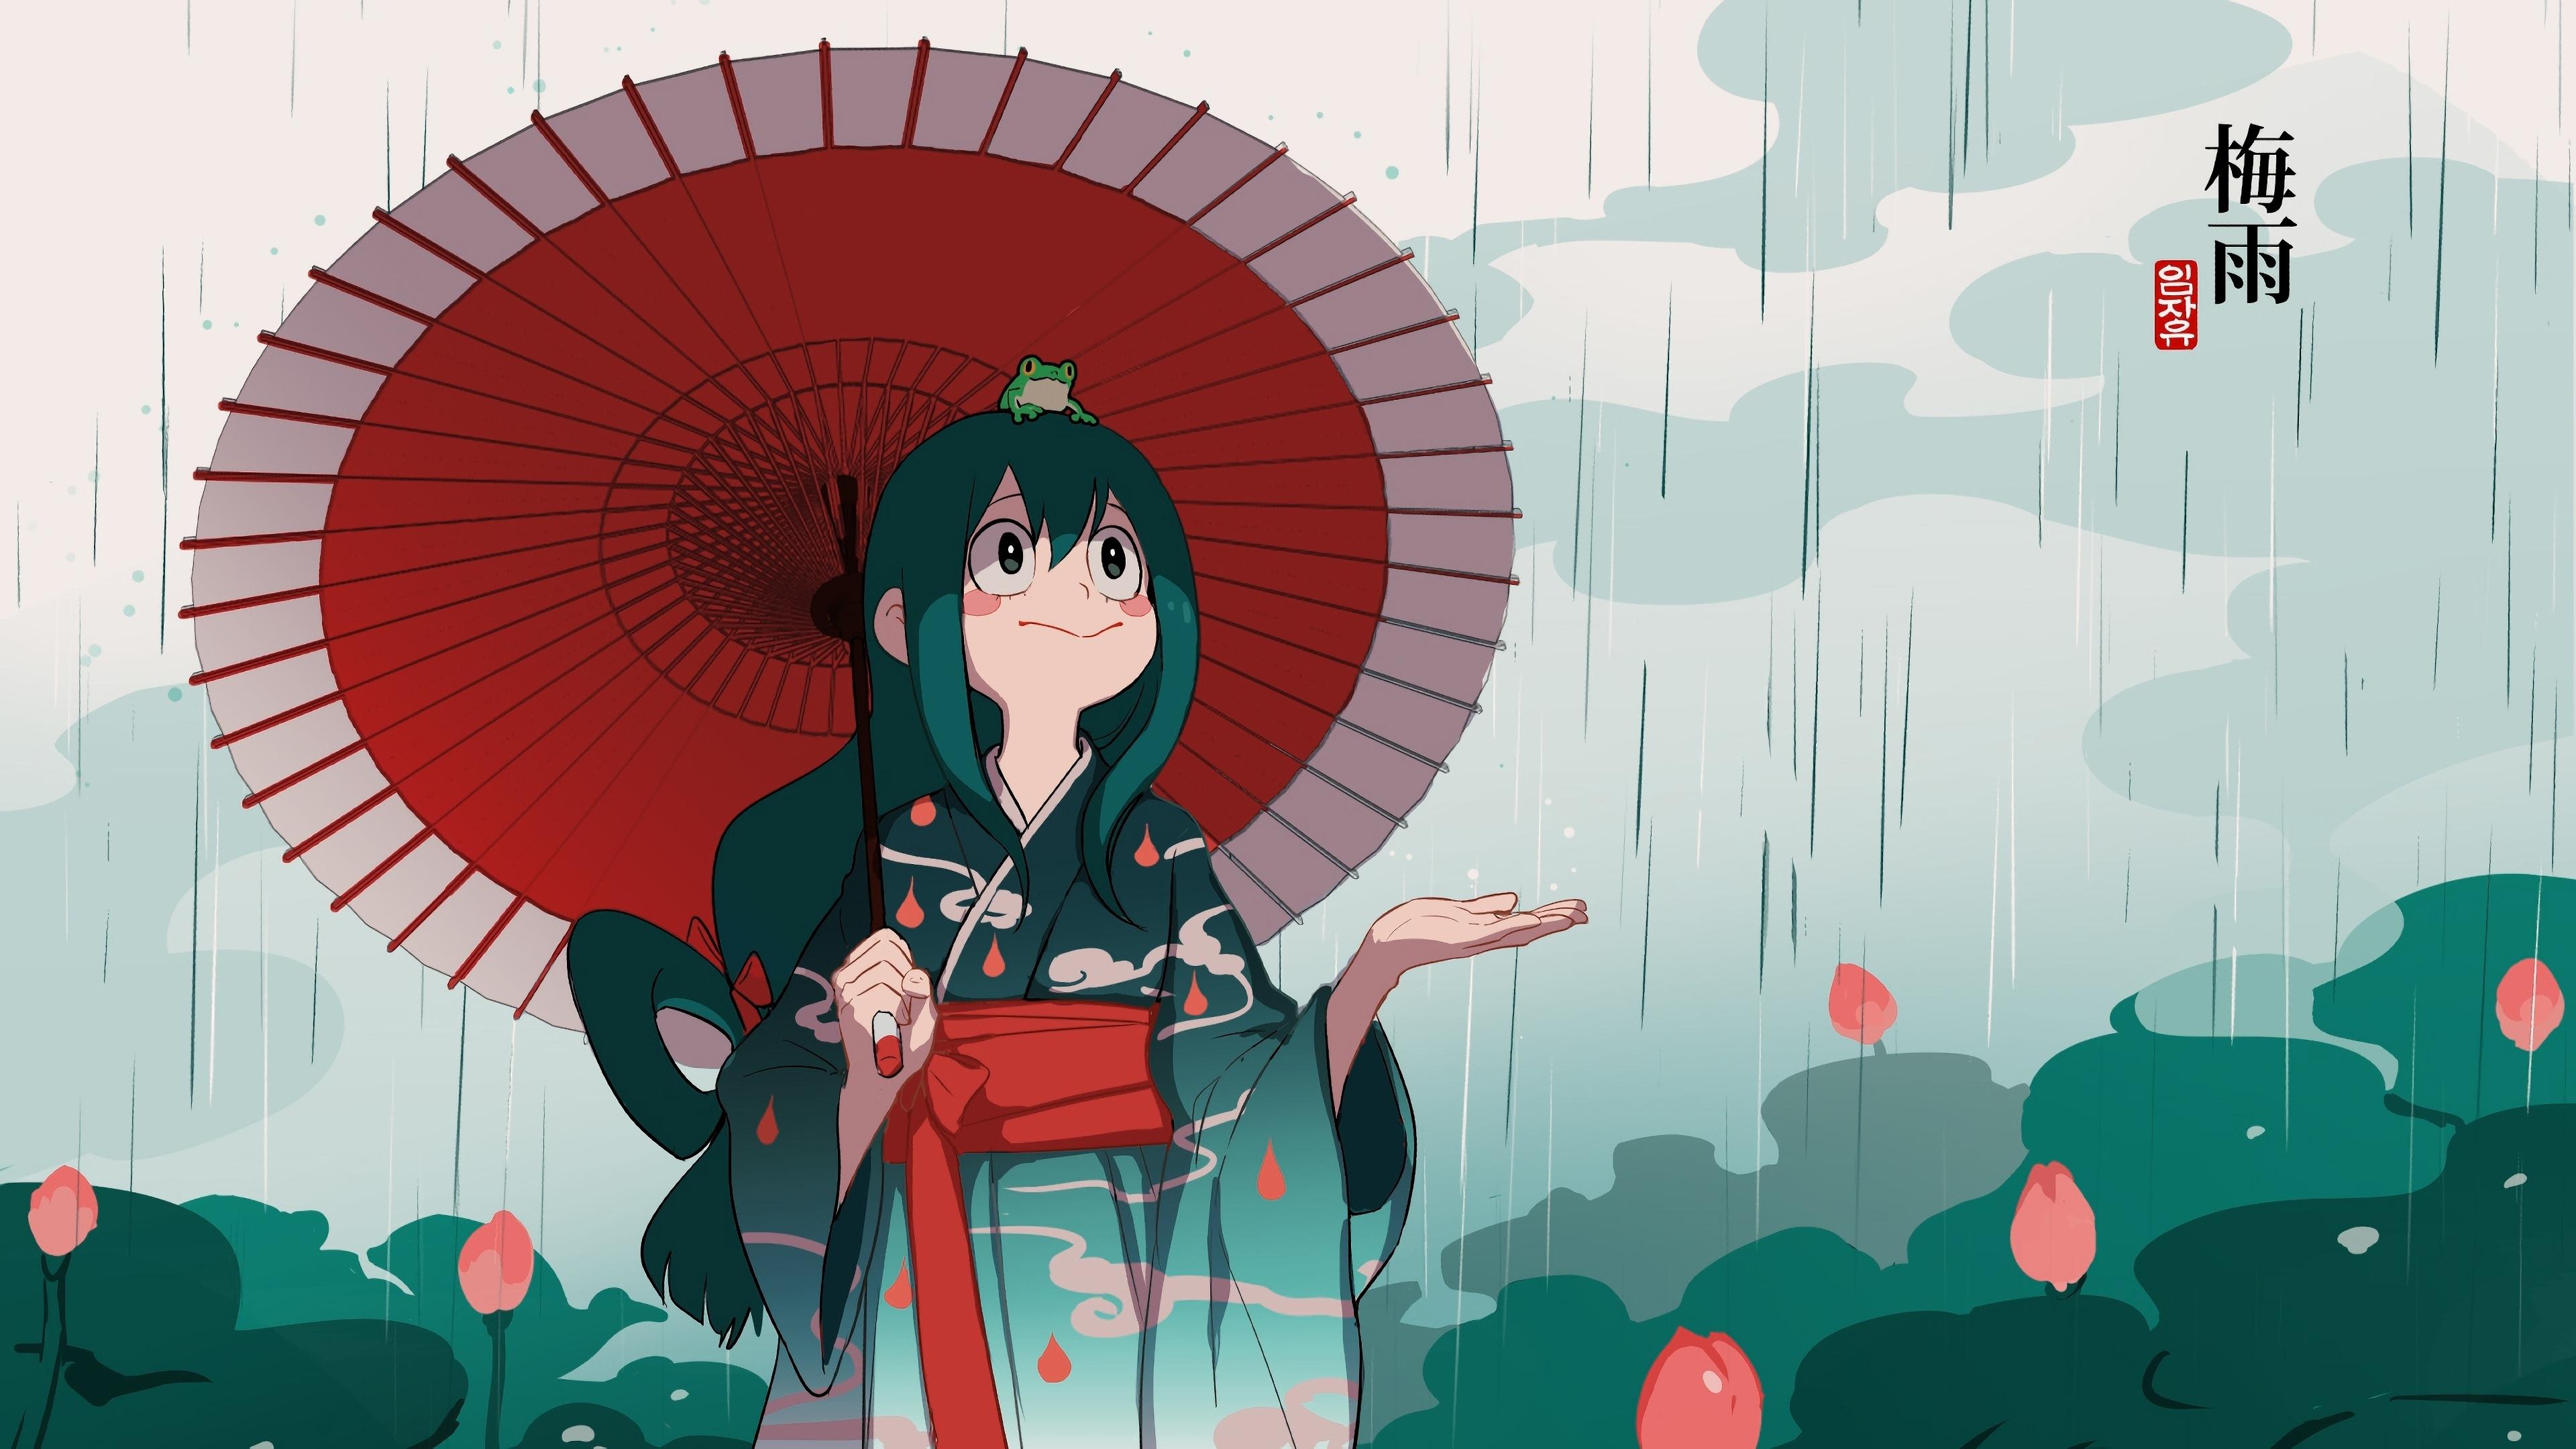 Tsuyu Asui Art Wallpaper Hd Anime 4k Wallpapers Images